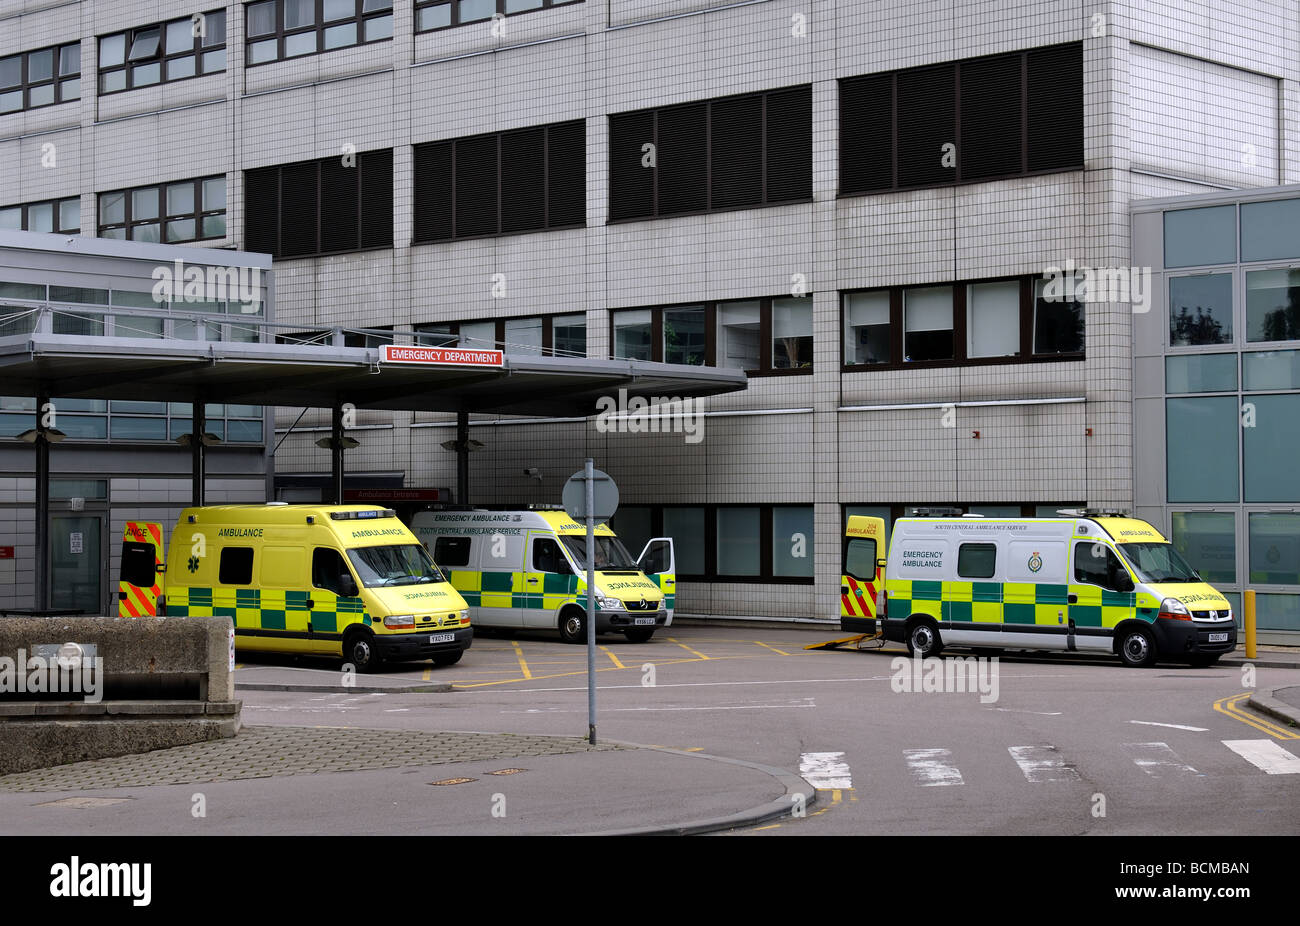 Ambulances à l'Hôpital John Radcliffe, Headington, Oxford, England, UK Photo Stock